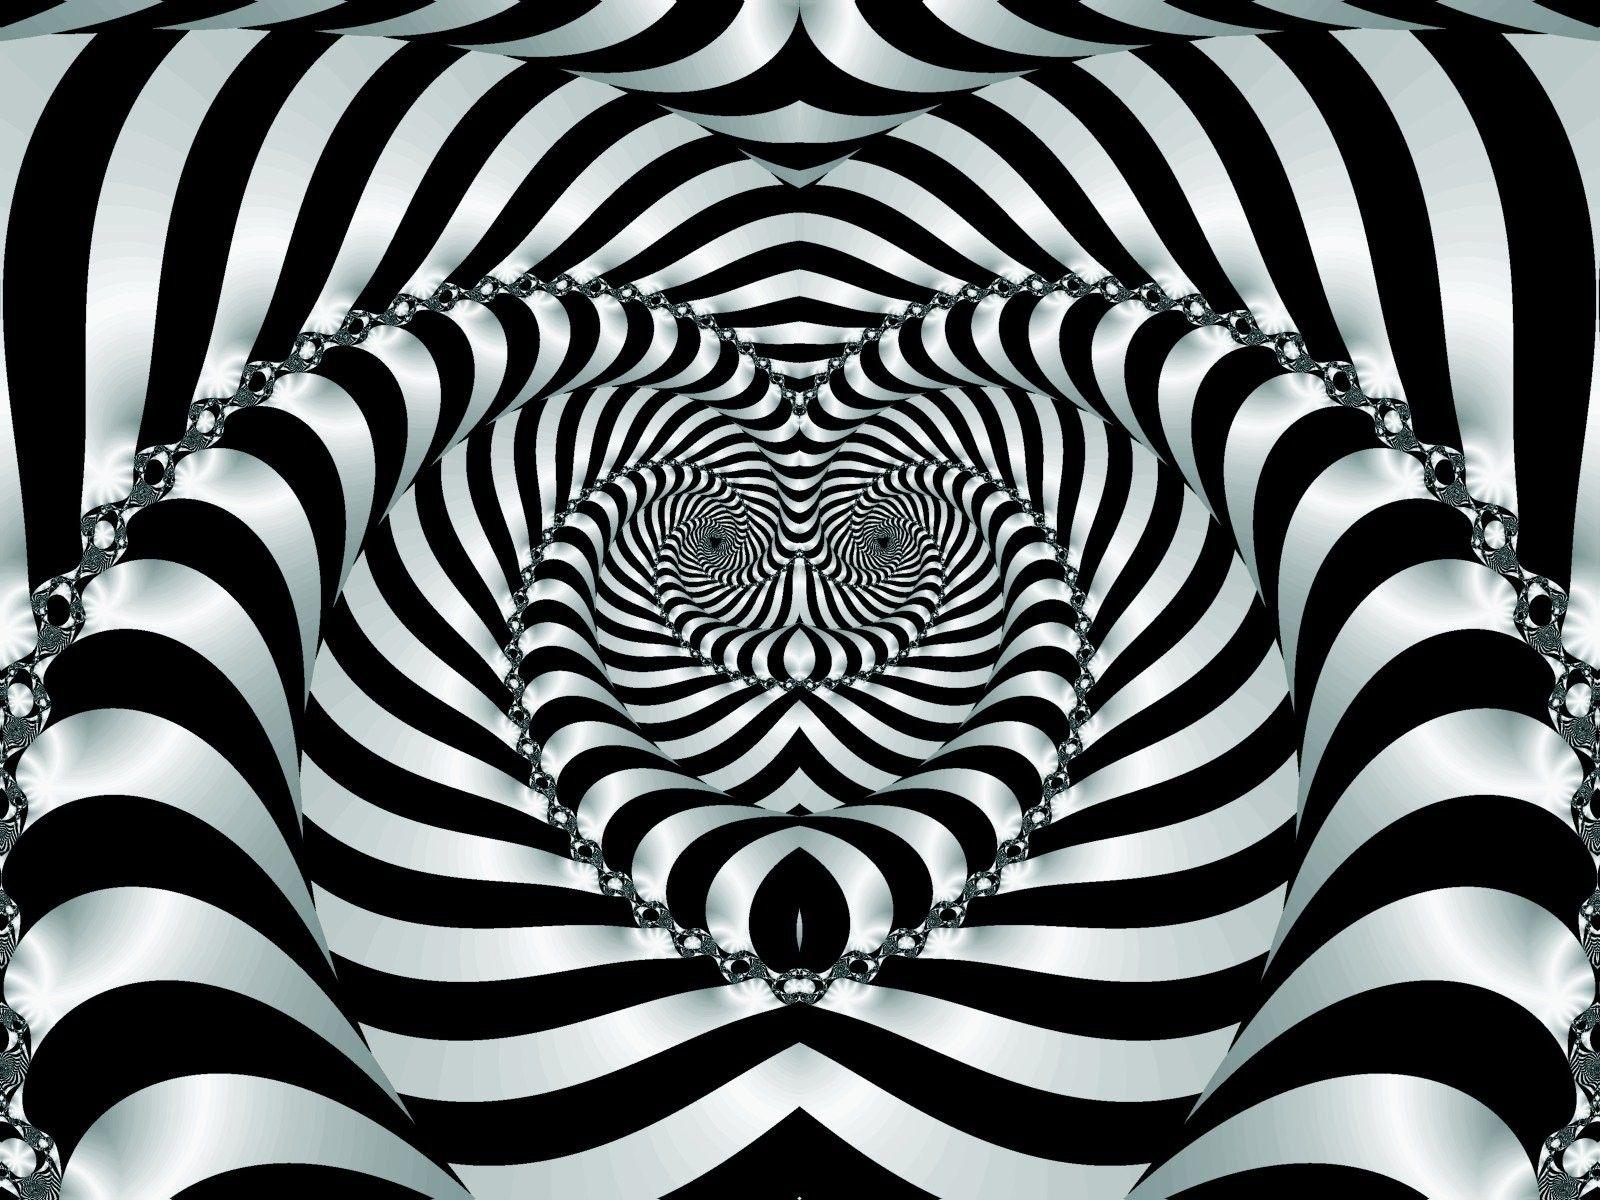 Illusion Black And White Illusions Illusions Optical Illusions